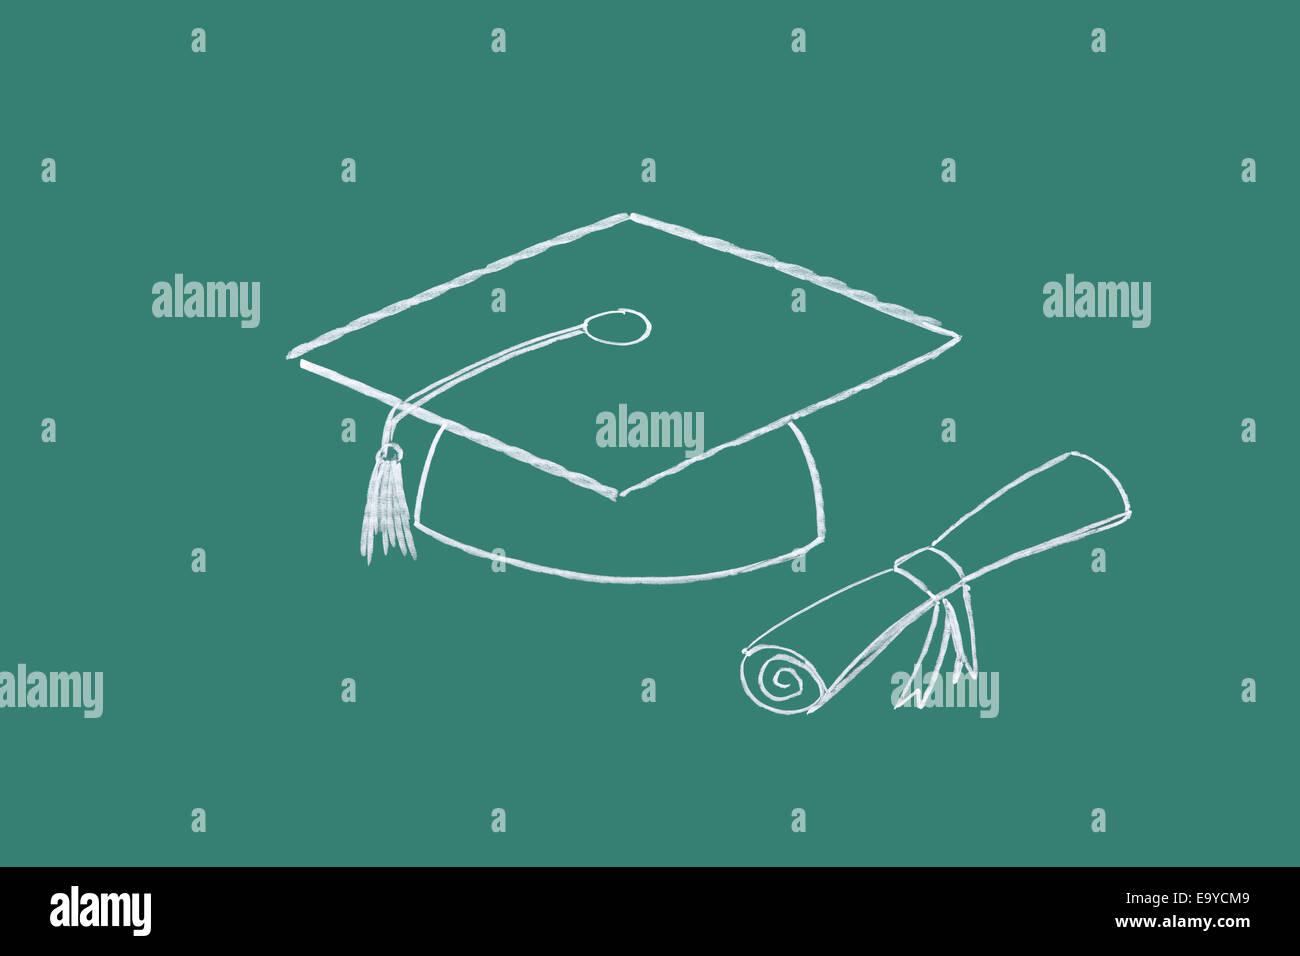 Diploma and graduation cap drawn on blackboard - Stock Image